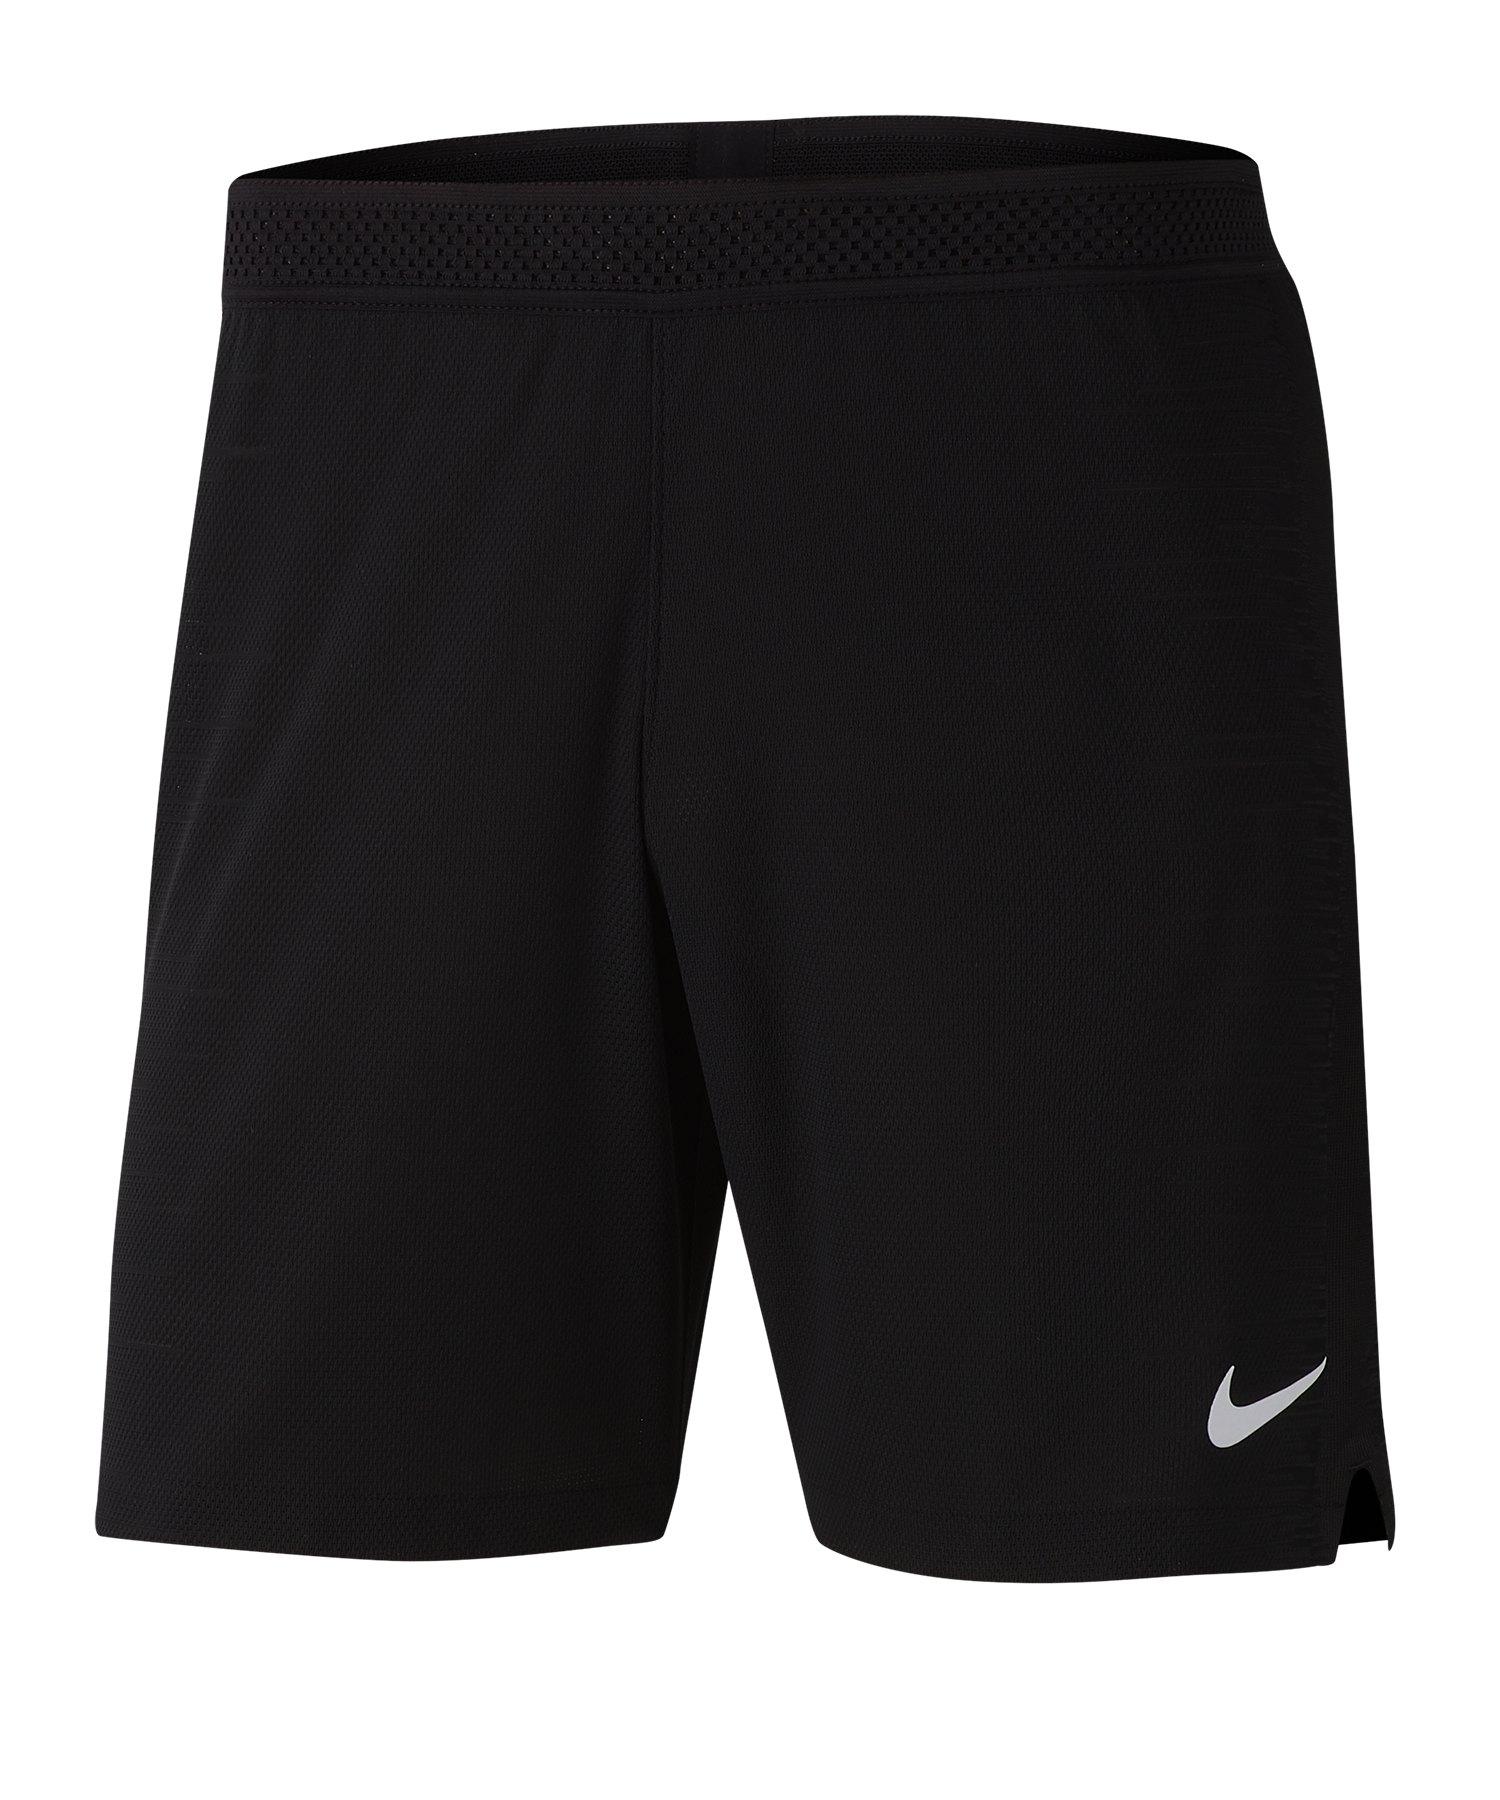 Nike Vaporknit II Short Schwarz F010 - schwarz